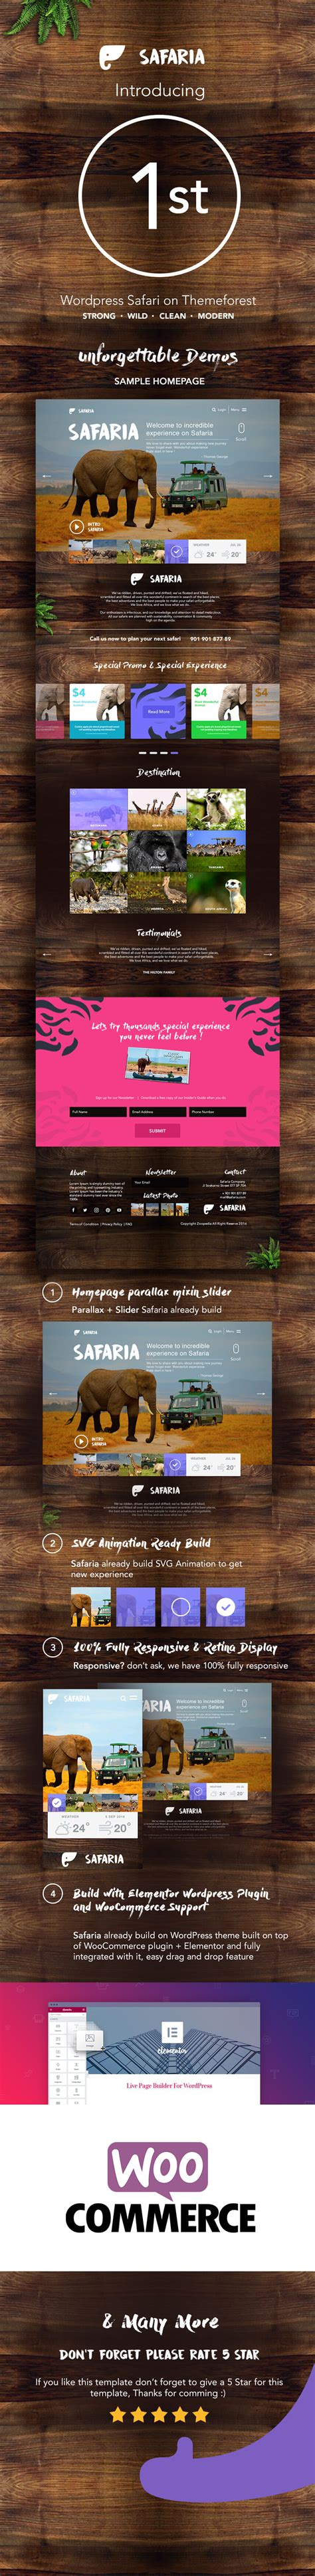 themeforest zoo safaria safari zoo wordpress theme by codeopus